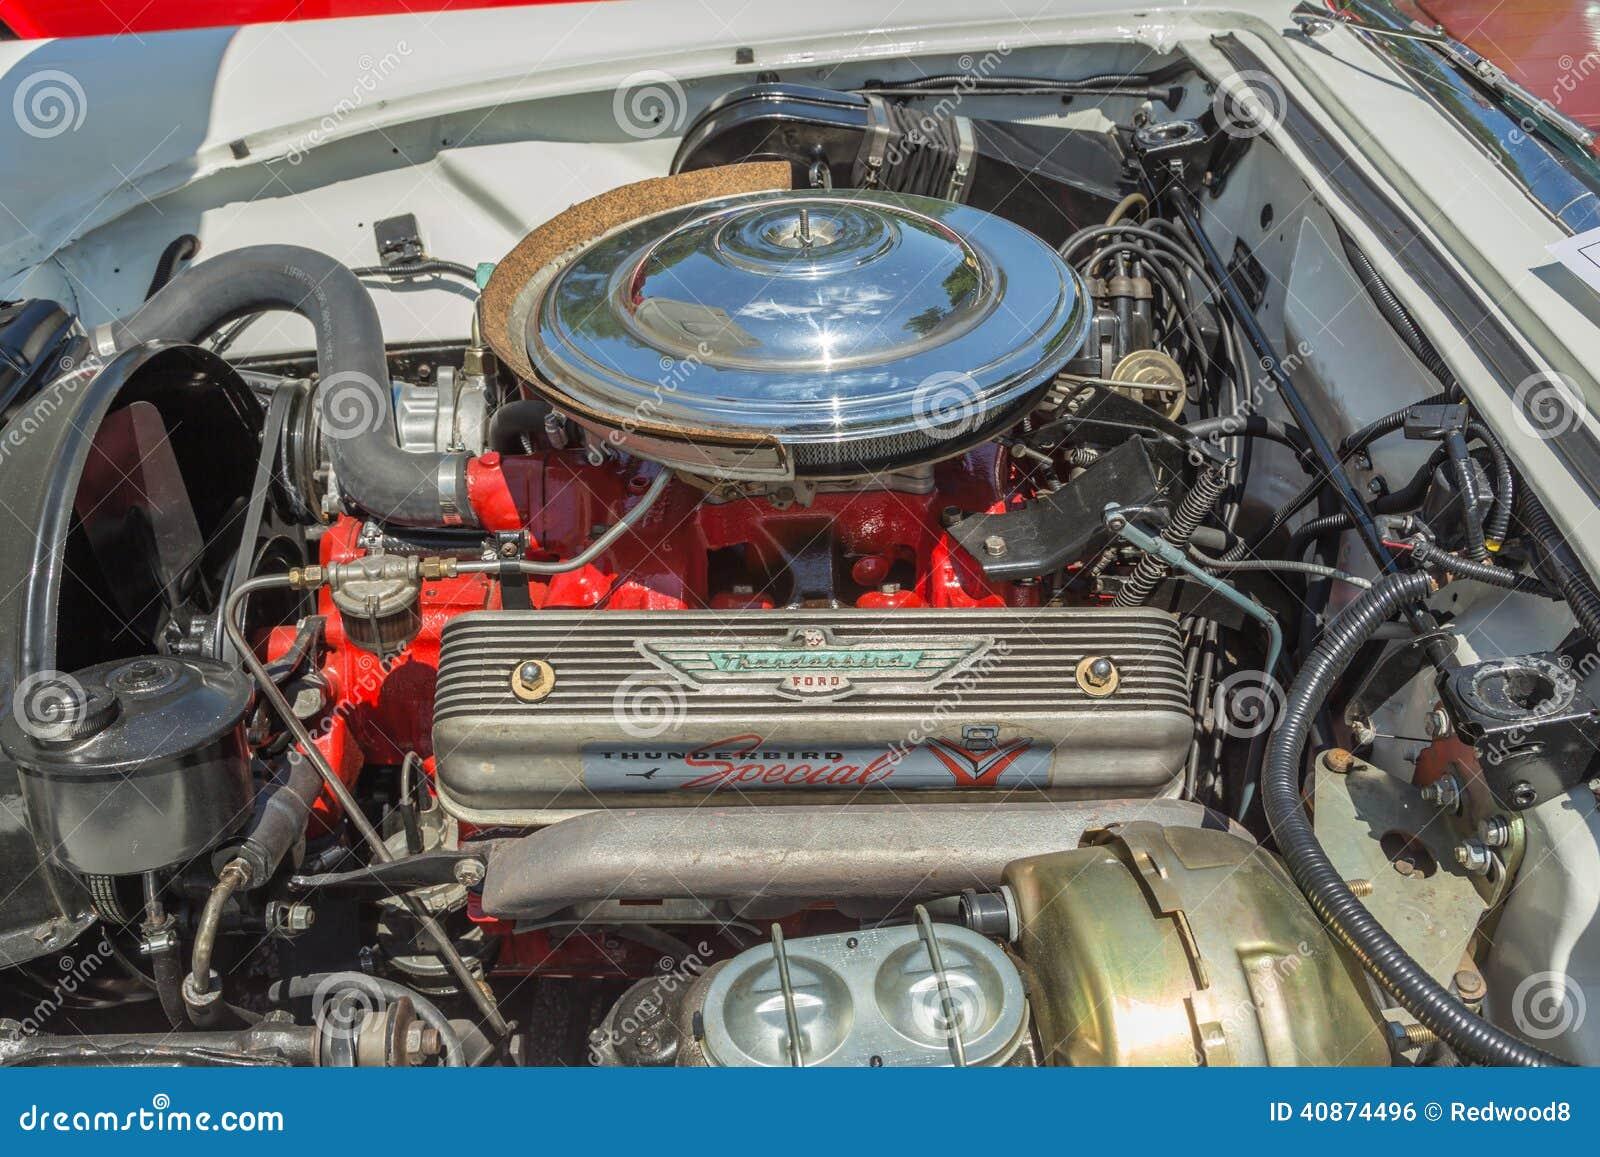 Early ford thunderbird v 8 motor editorial photo image for Ford motor company stock